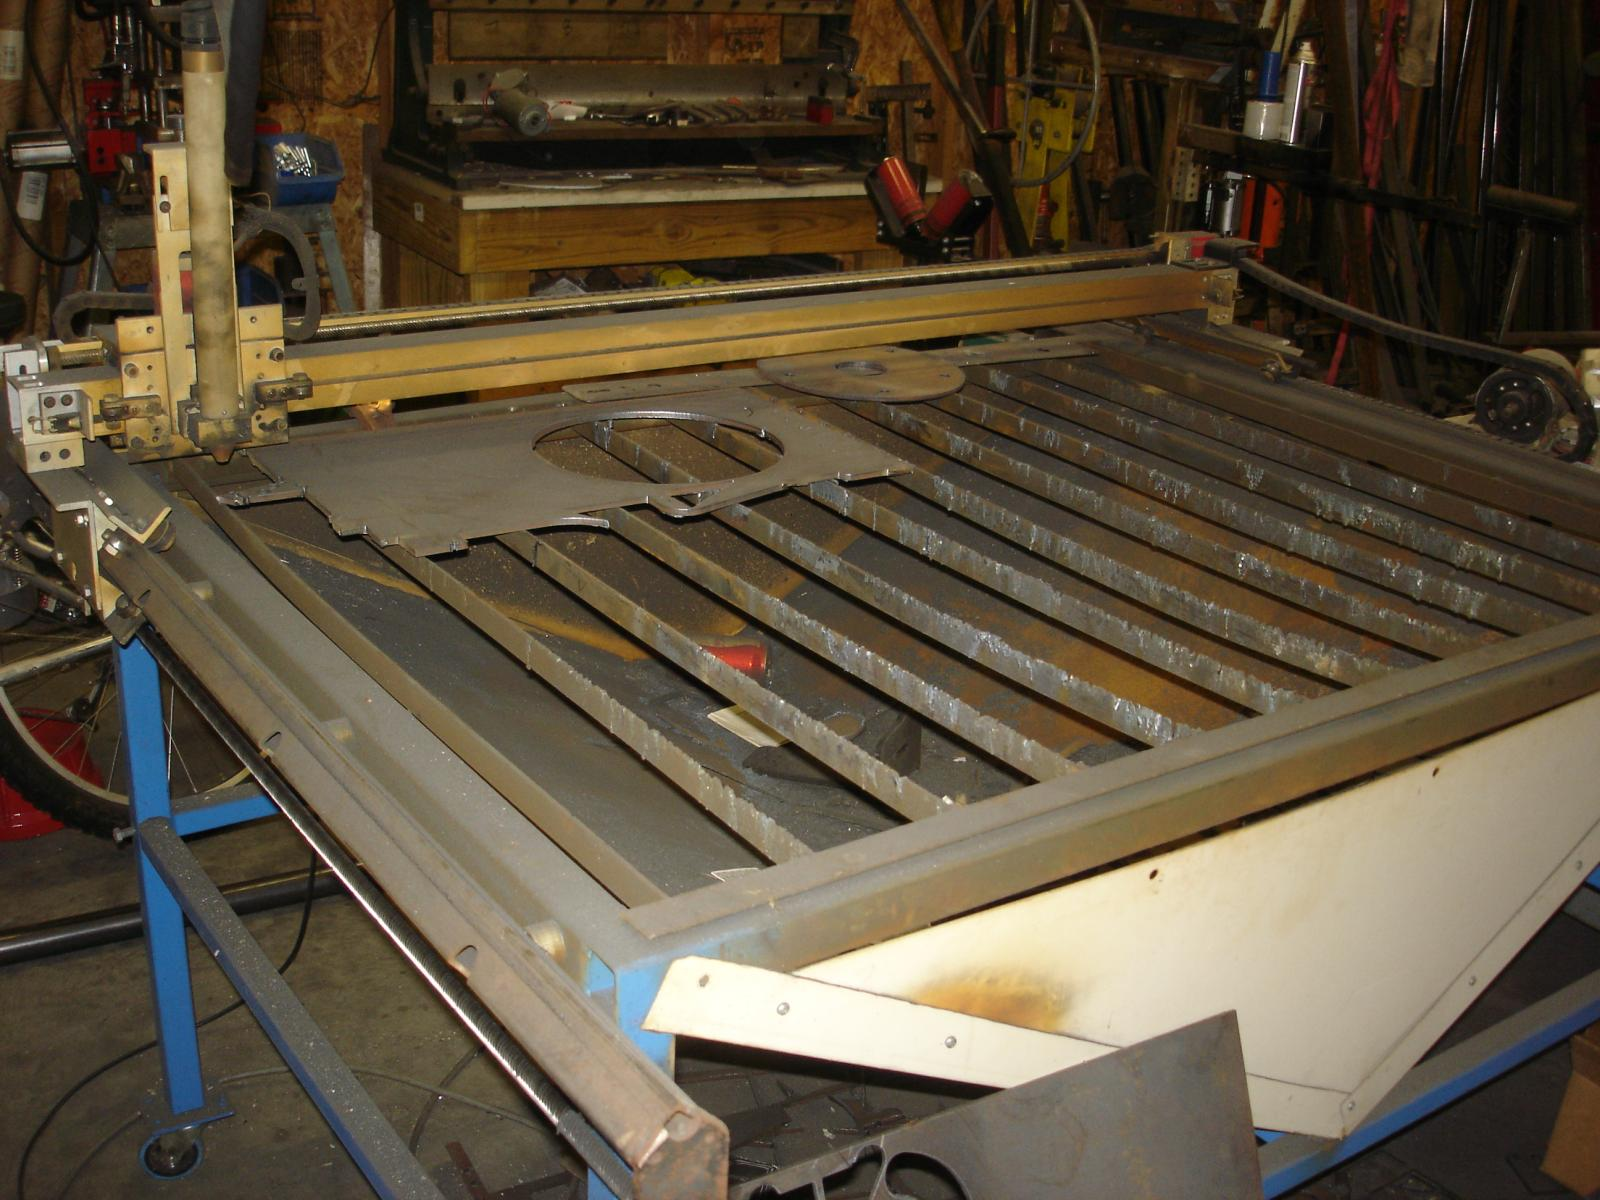 Homemade CNC Plasma Cutting Table